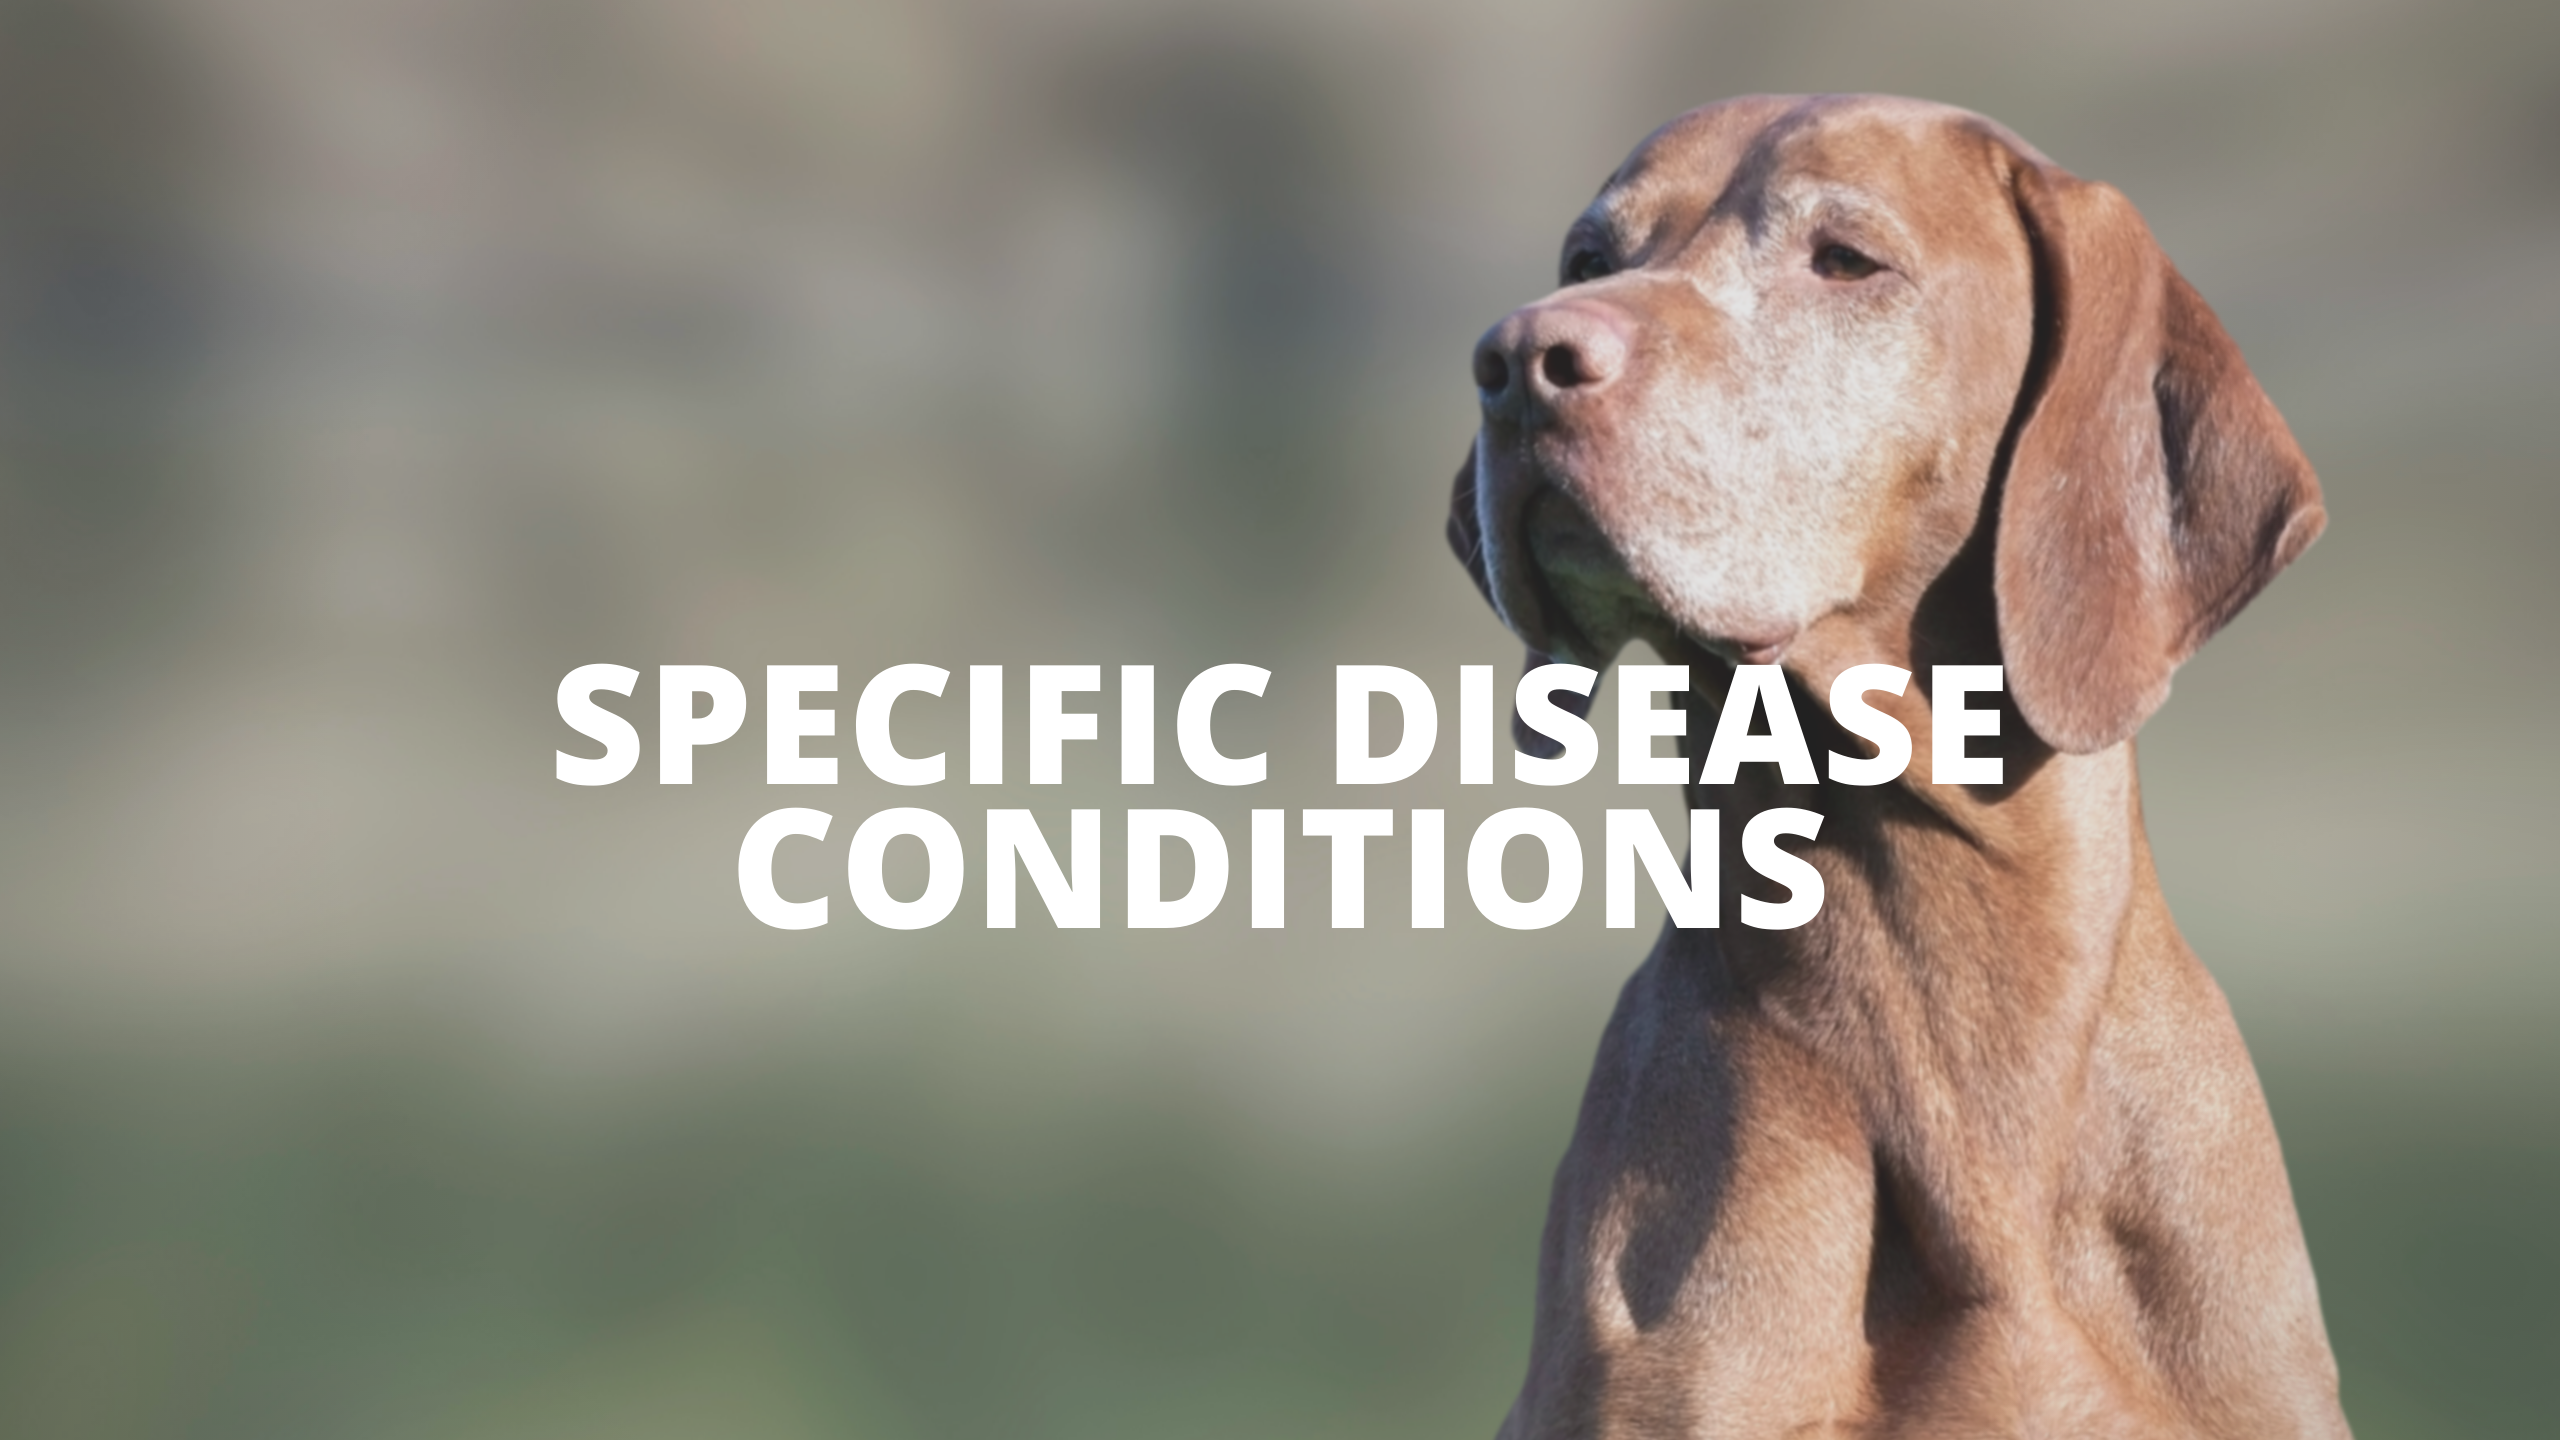 Specific Disease Conditions